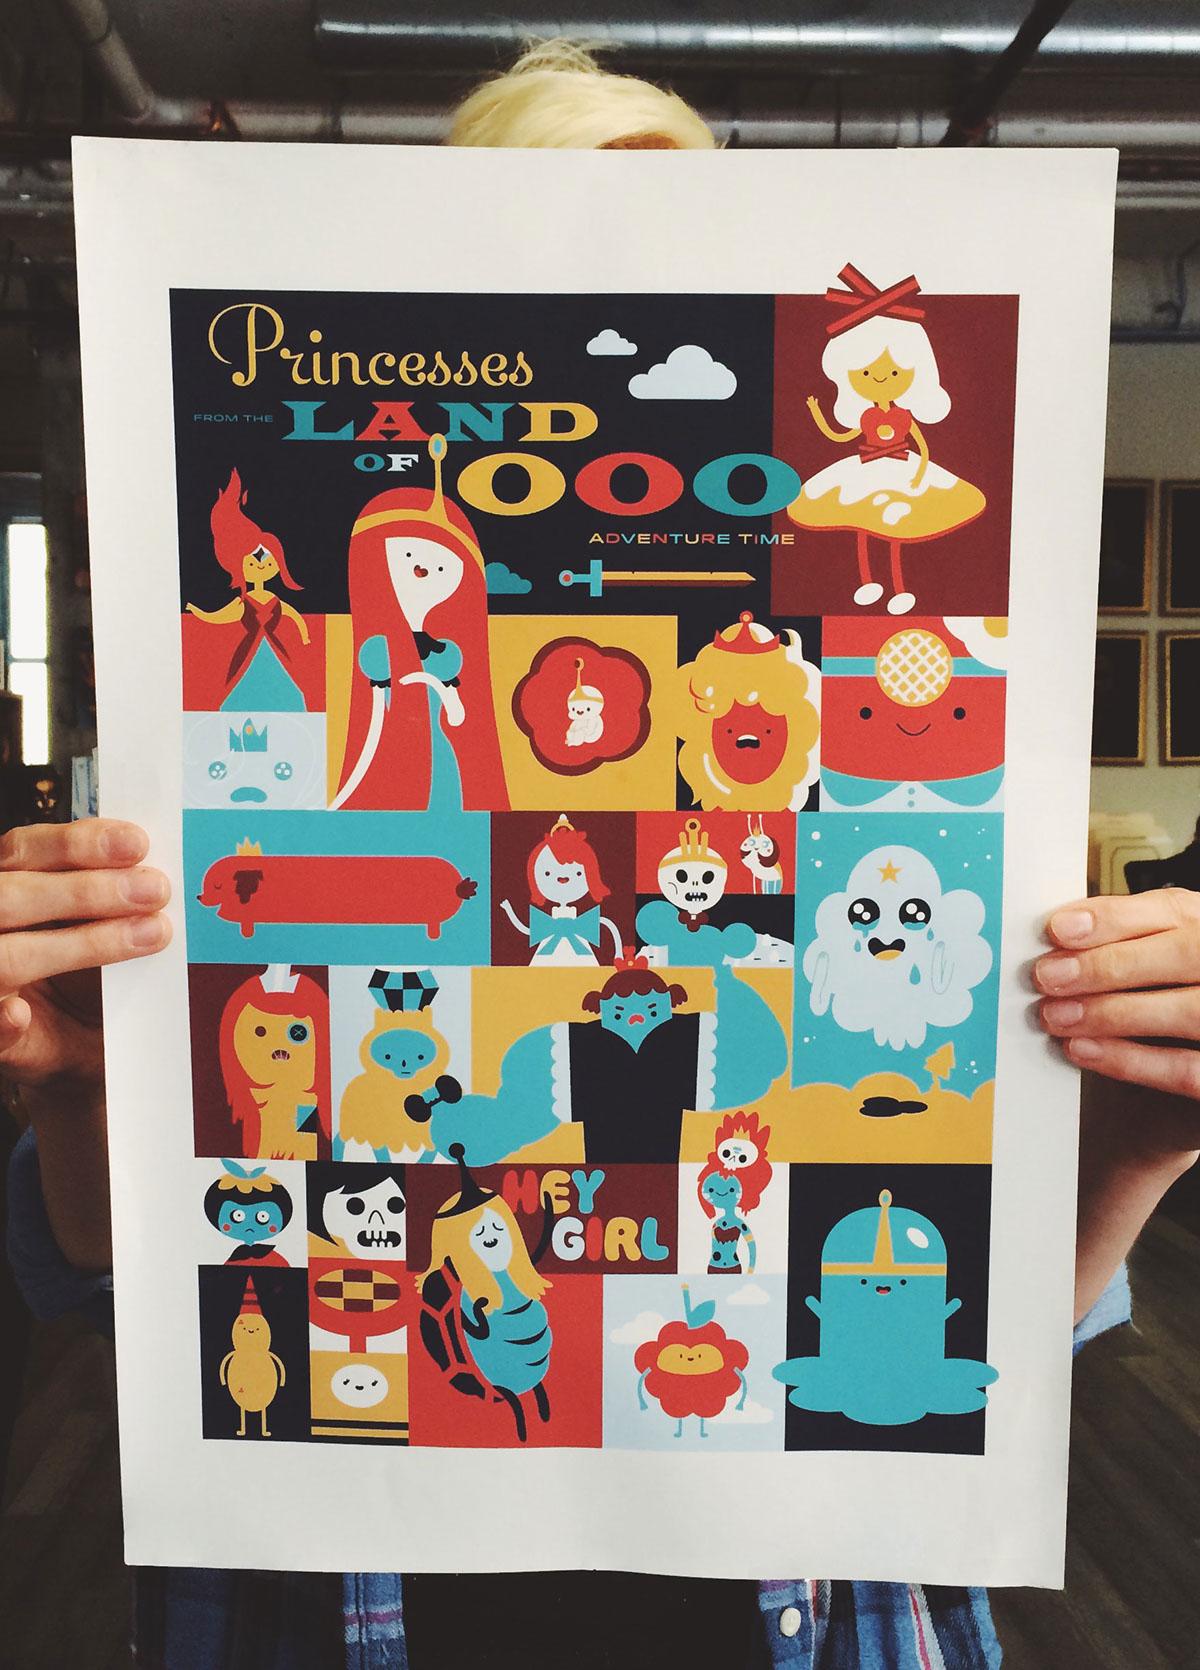 Adventure Time fakeanything Poster Design fanart Princess Lumpy Space Princess princess bumblegum cartoon network